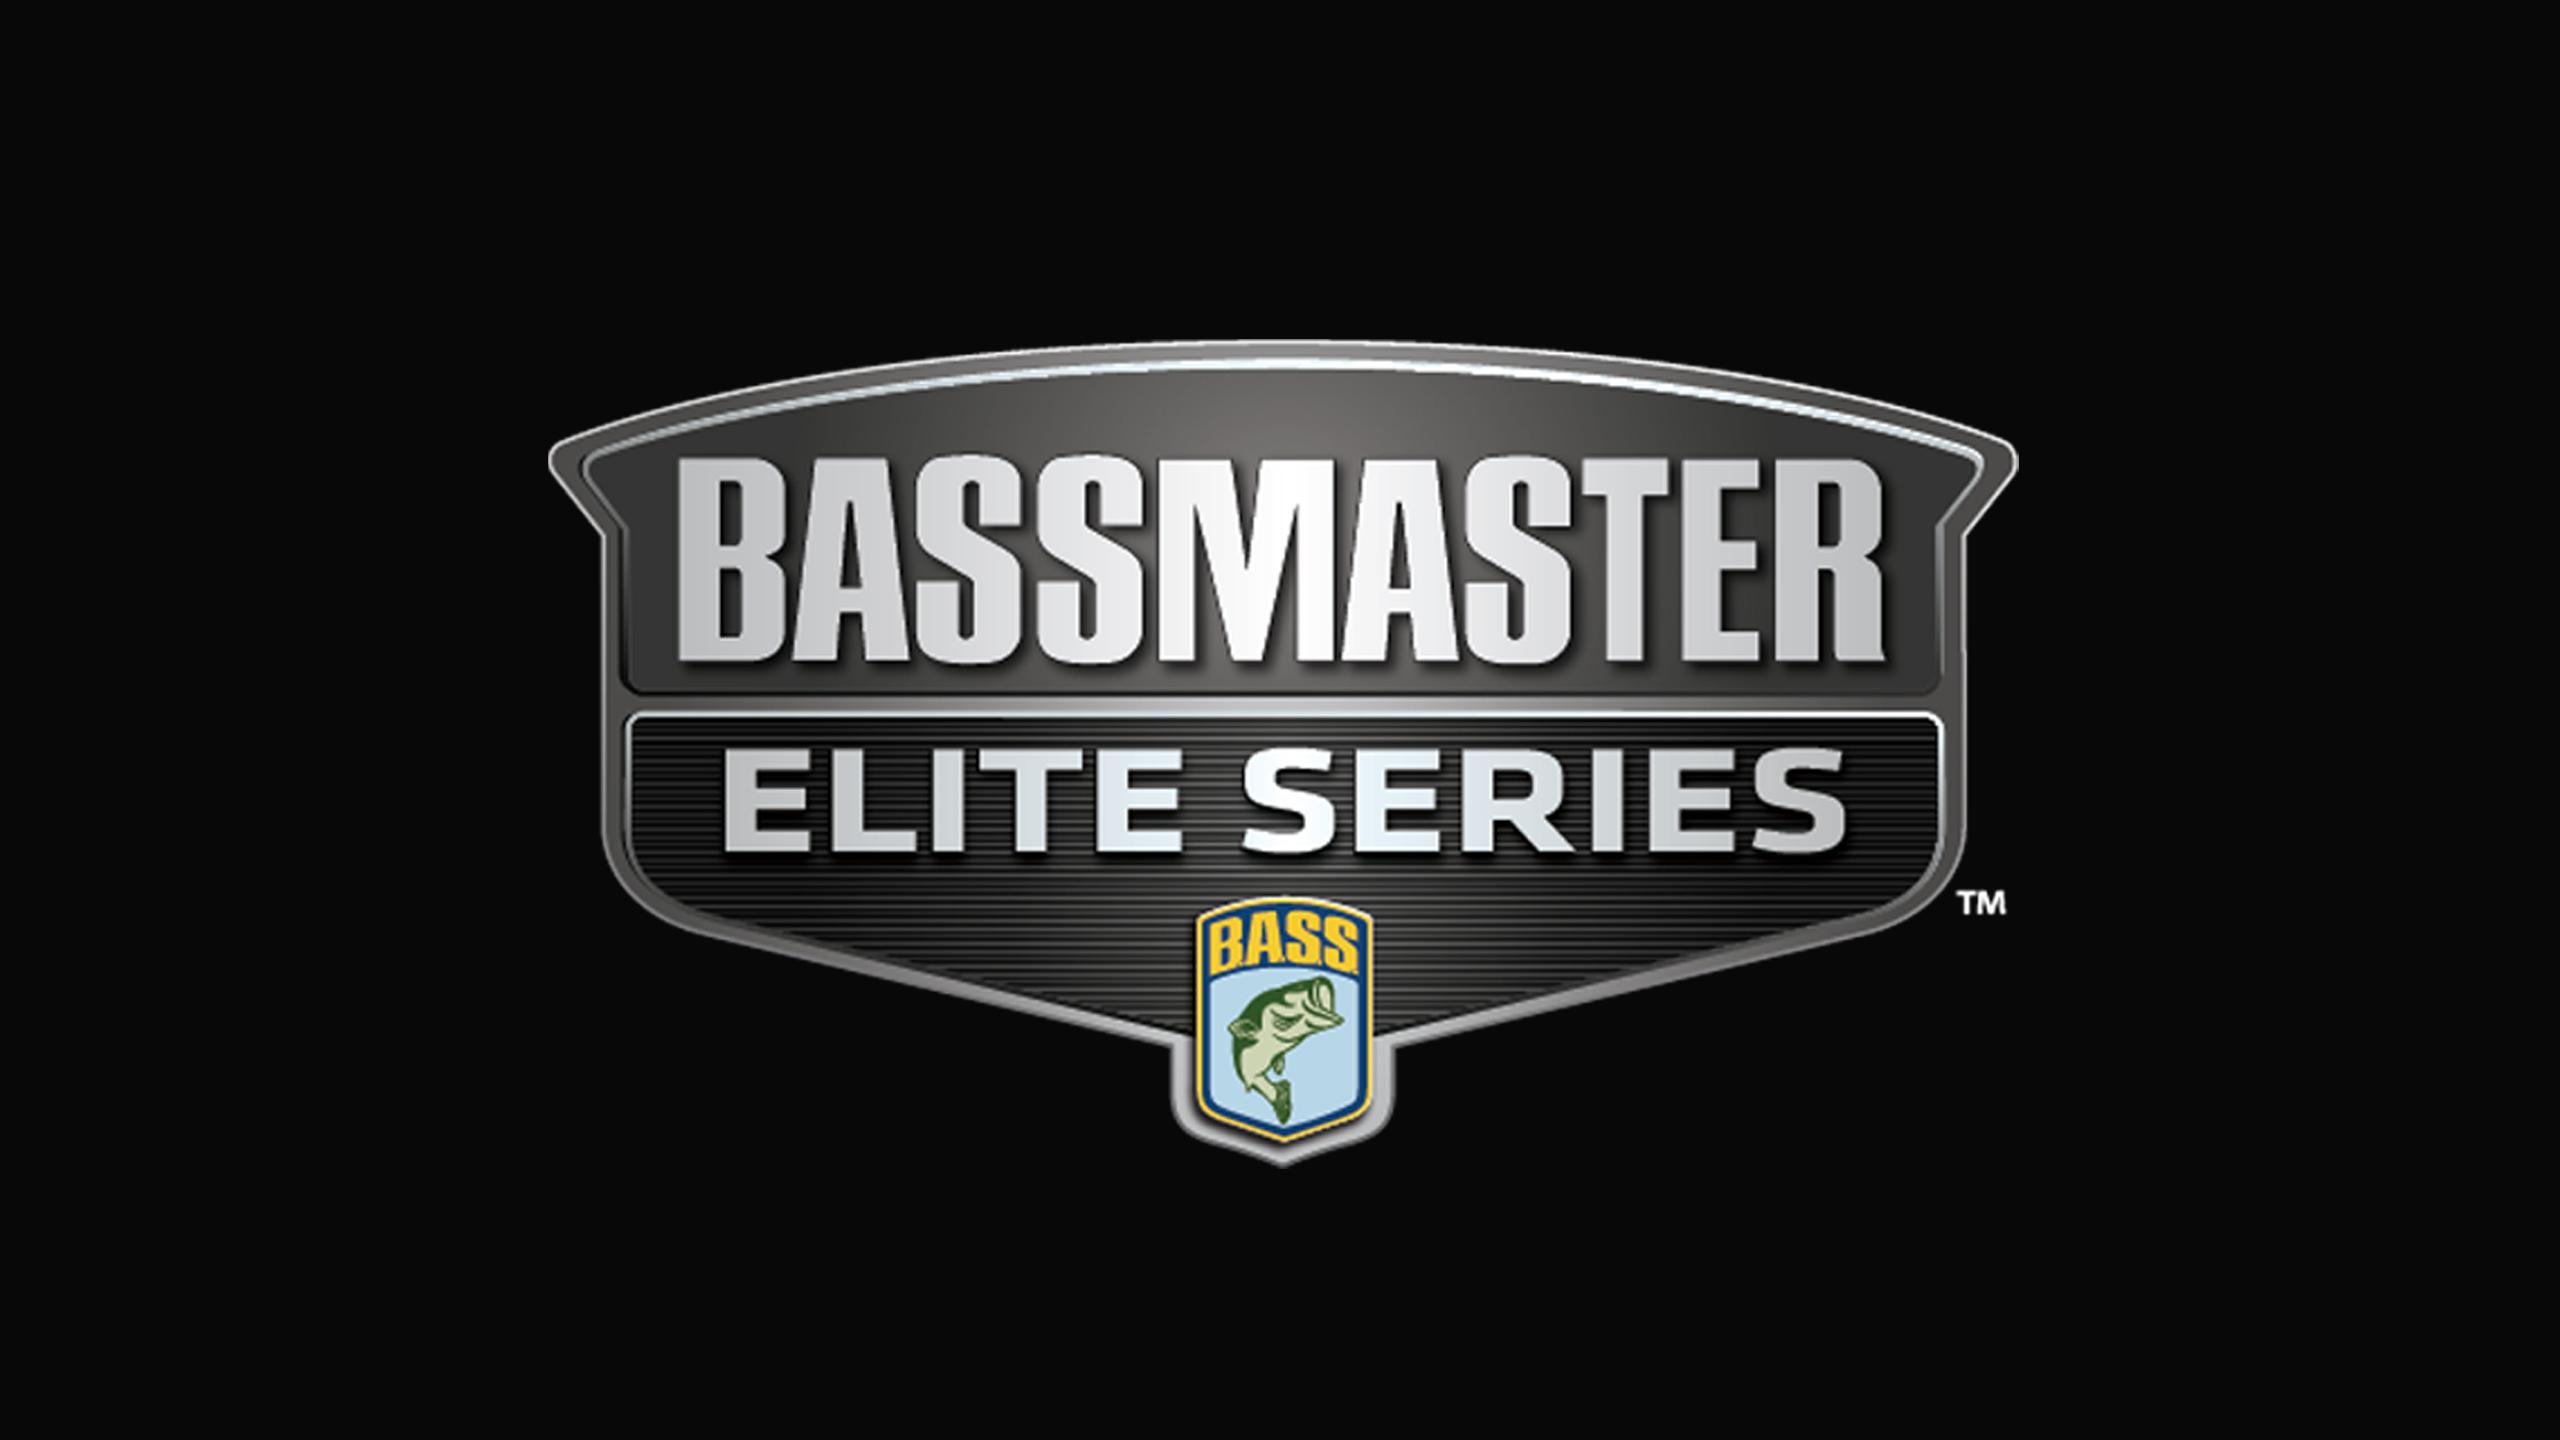 The Bassmaster Classic Bracket